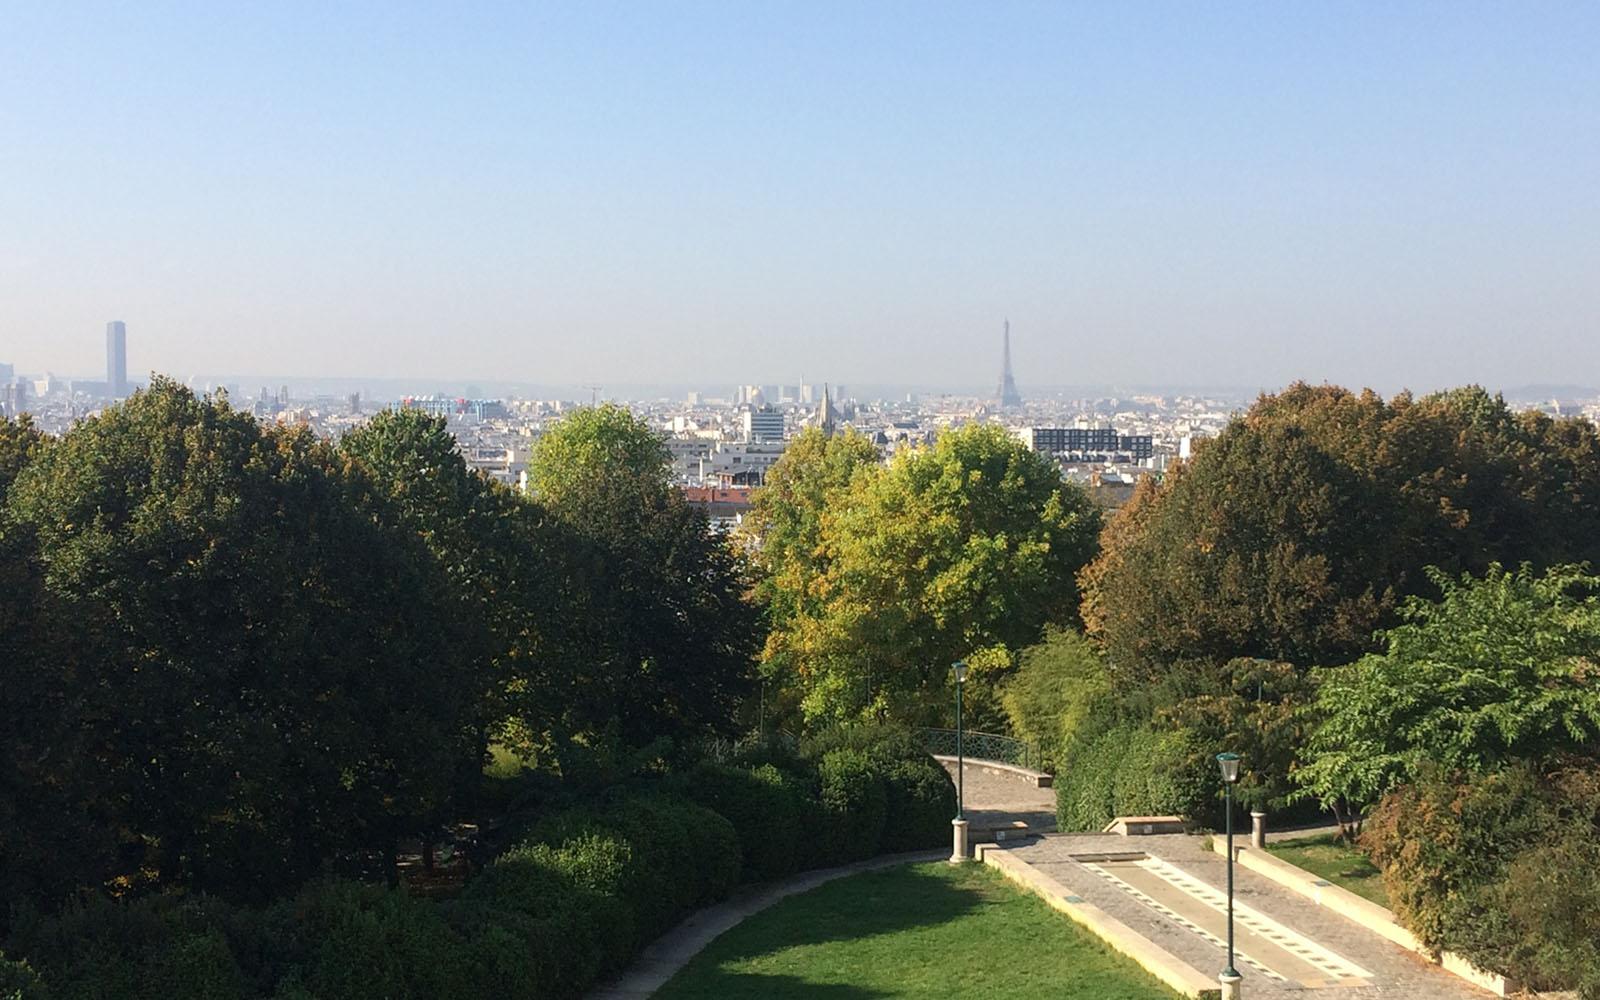 Una veduta di Parigi e della Torre Eiffel dal Parco di Belleville.